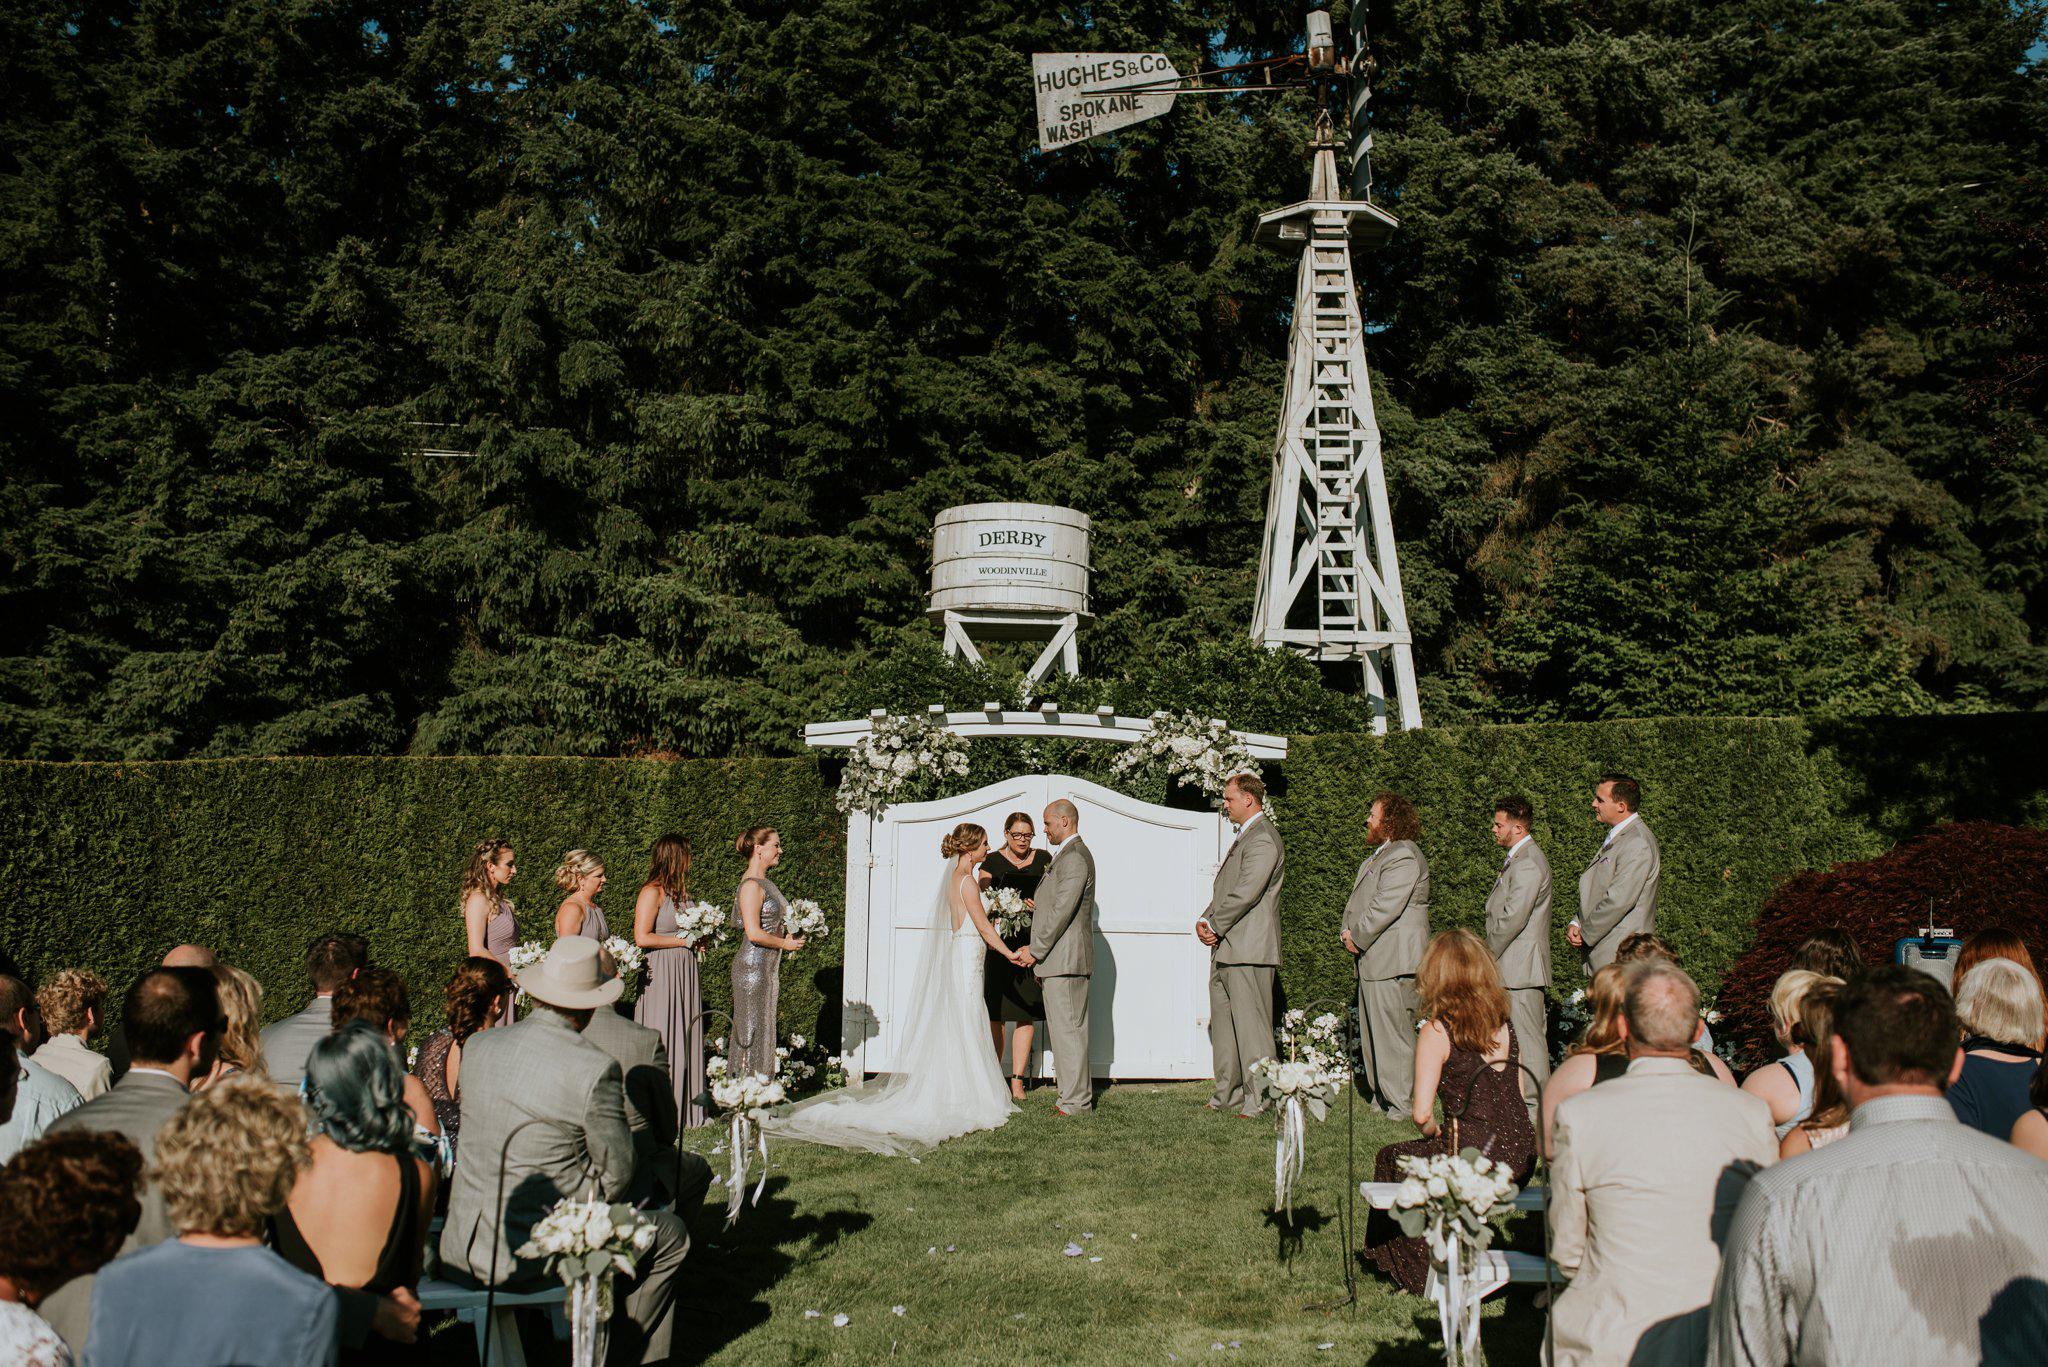 hollywood-school-house-wedding-seattle-photographer-caitlyn-nikula-74.jpg